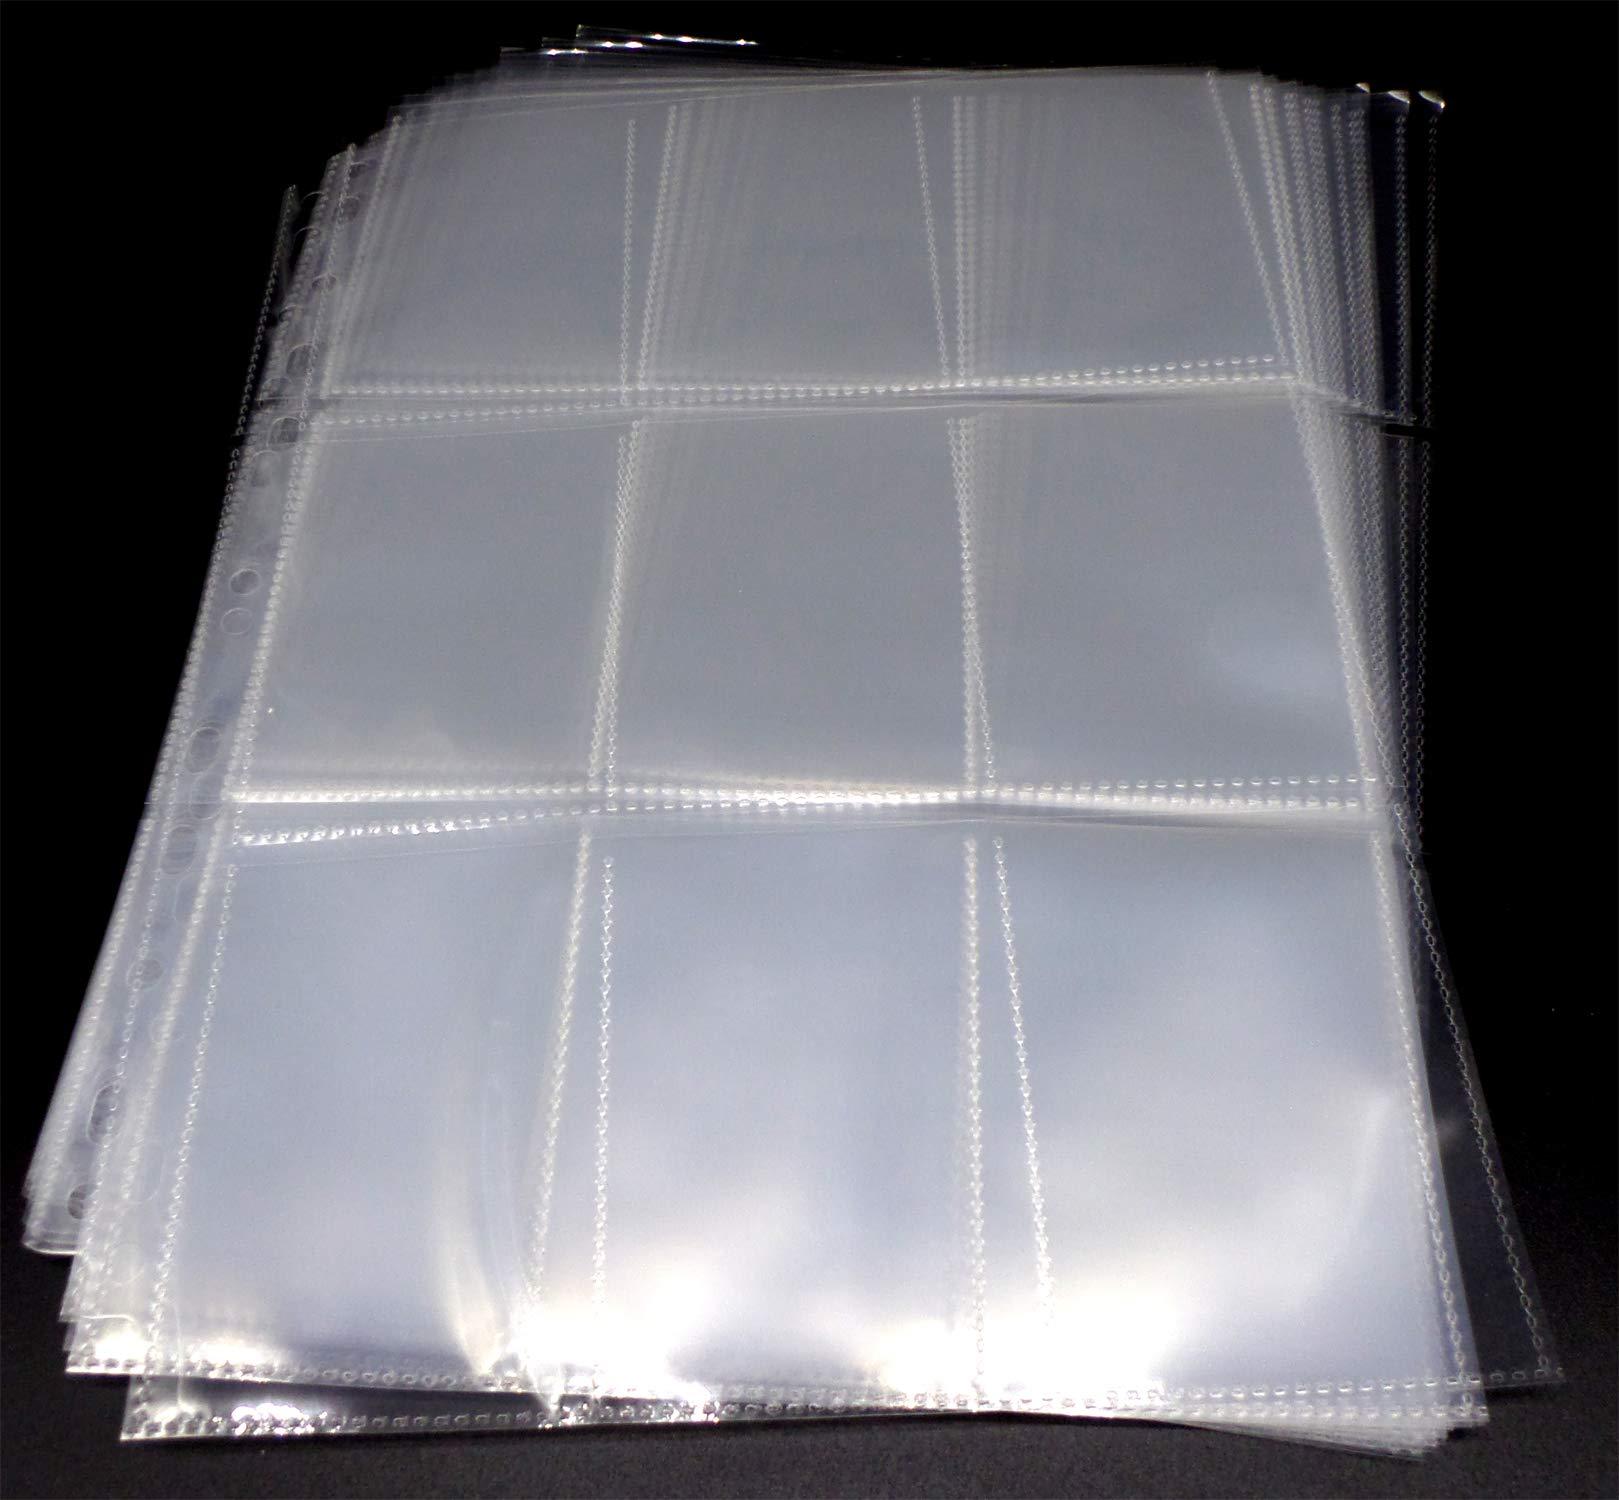 100 Docsmagic.de 18-Pocket Pages Black Toploading 3-Ring Album Ordnerseiten